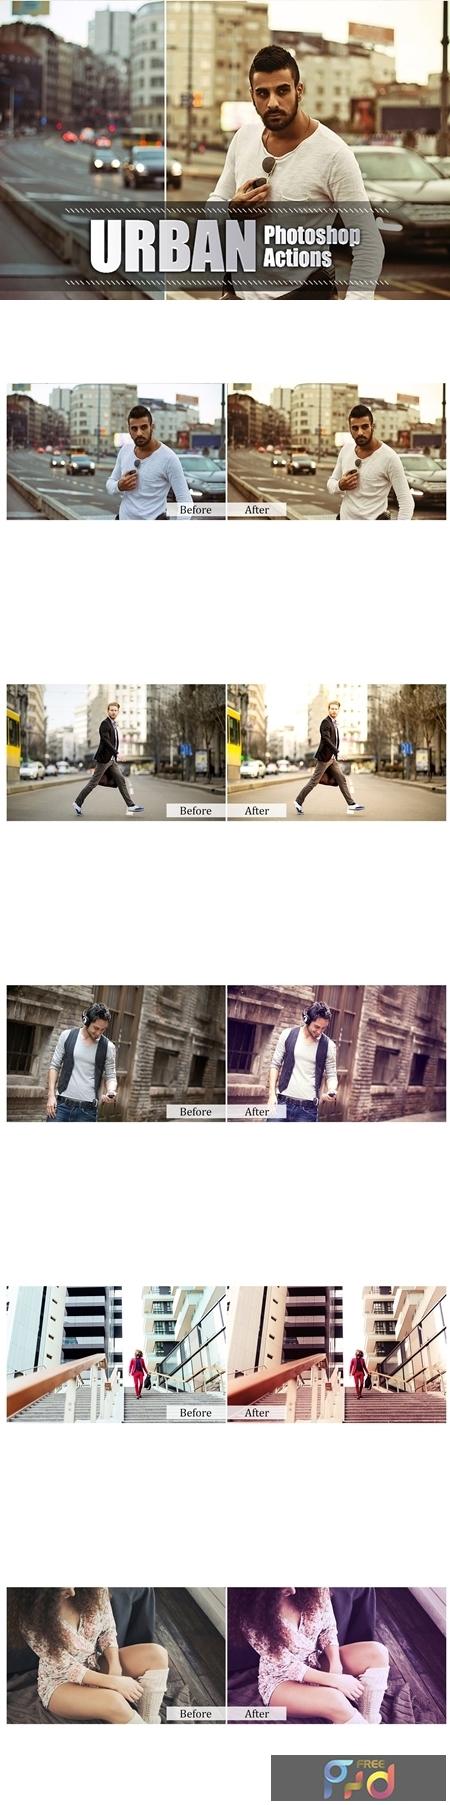 60 Urban Photoshop Actions Vol2 3938023 1